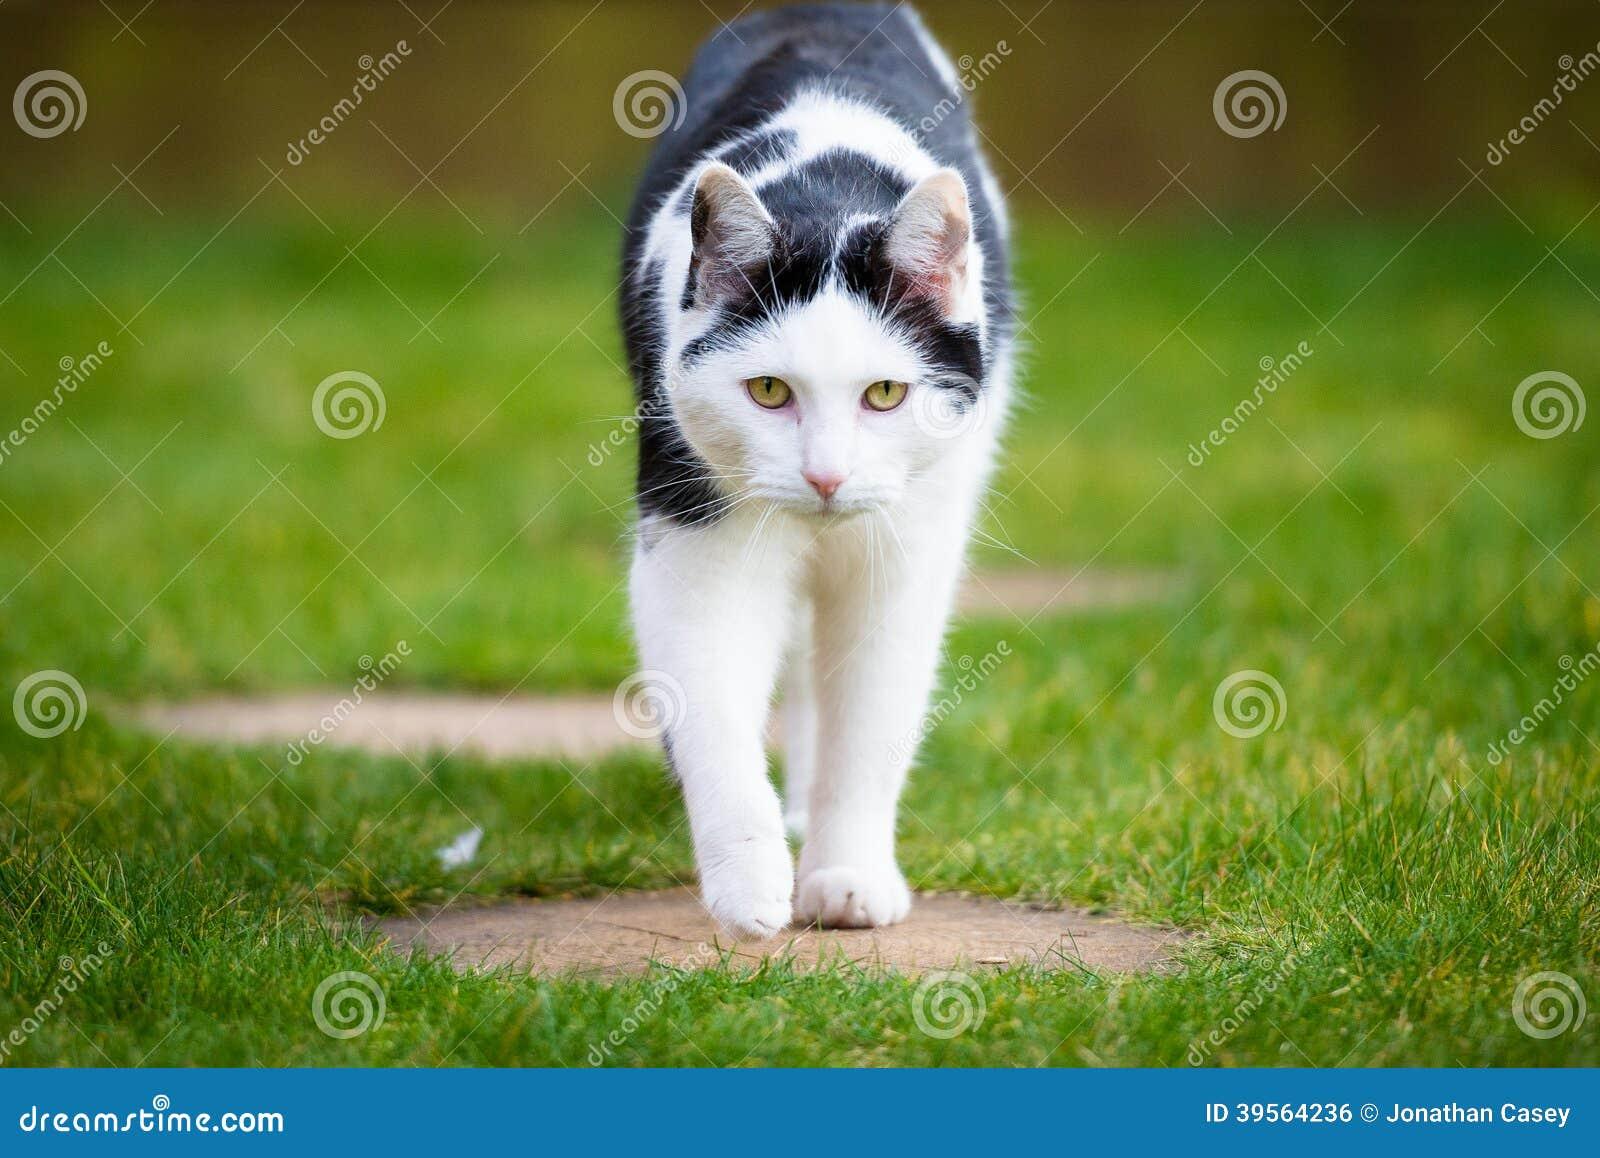 Black Bandit Cat